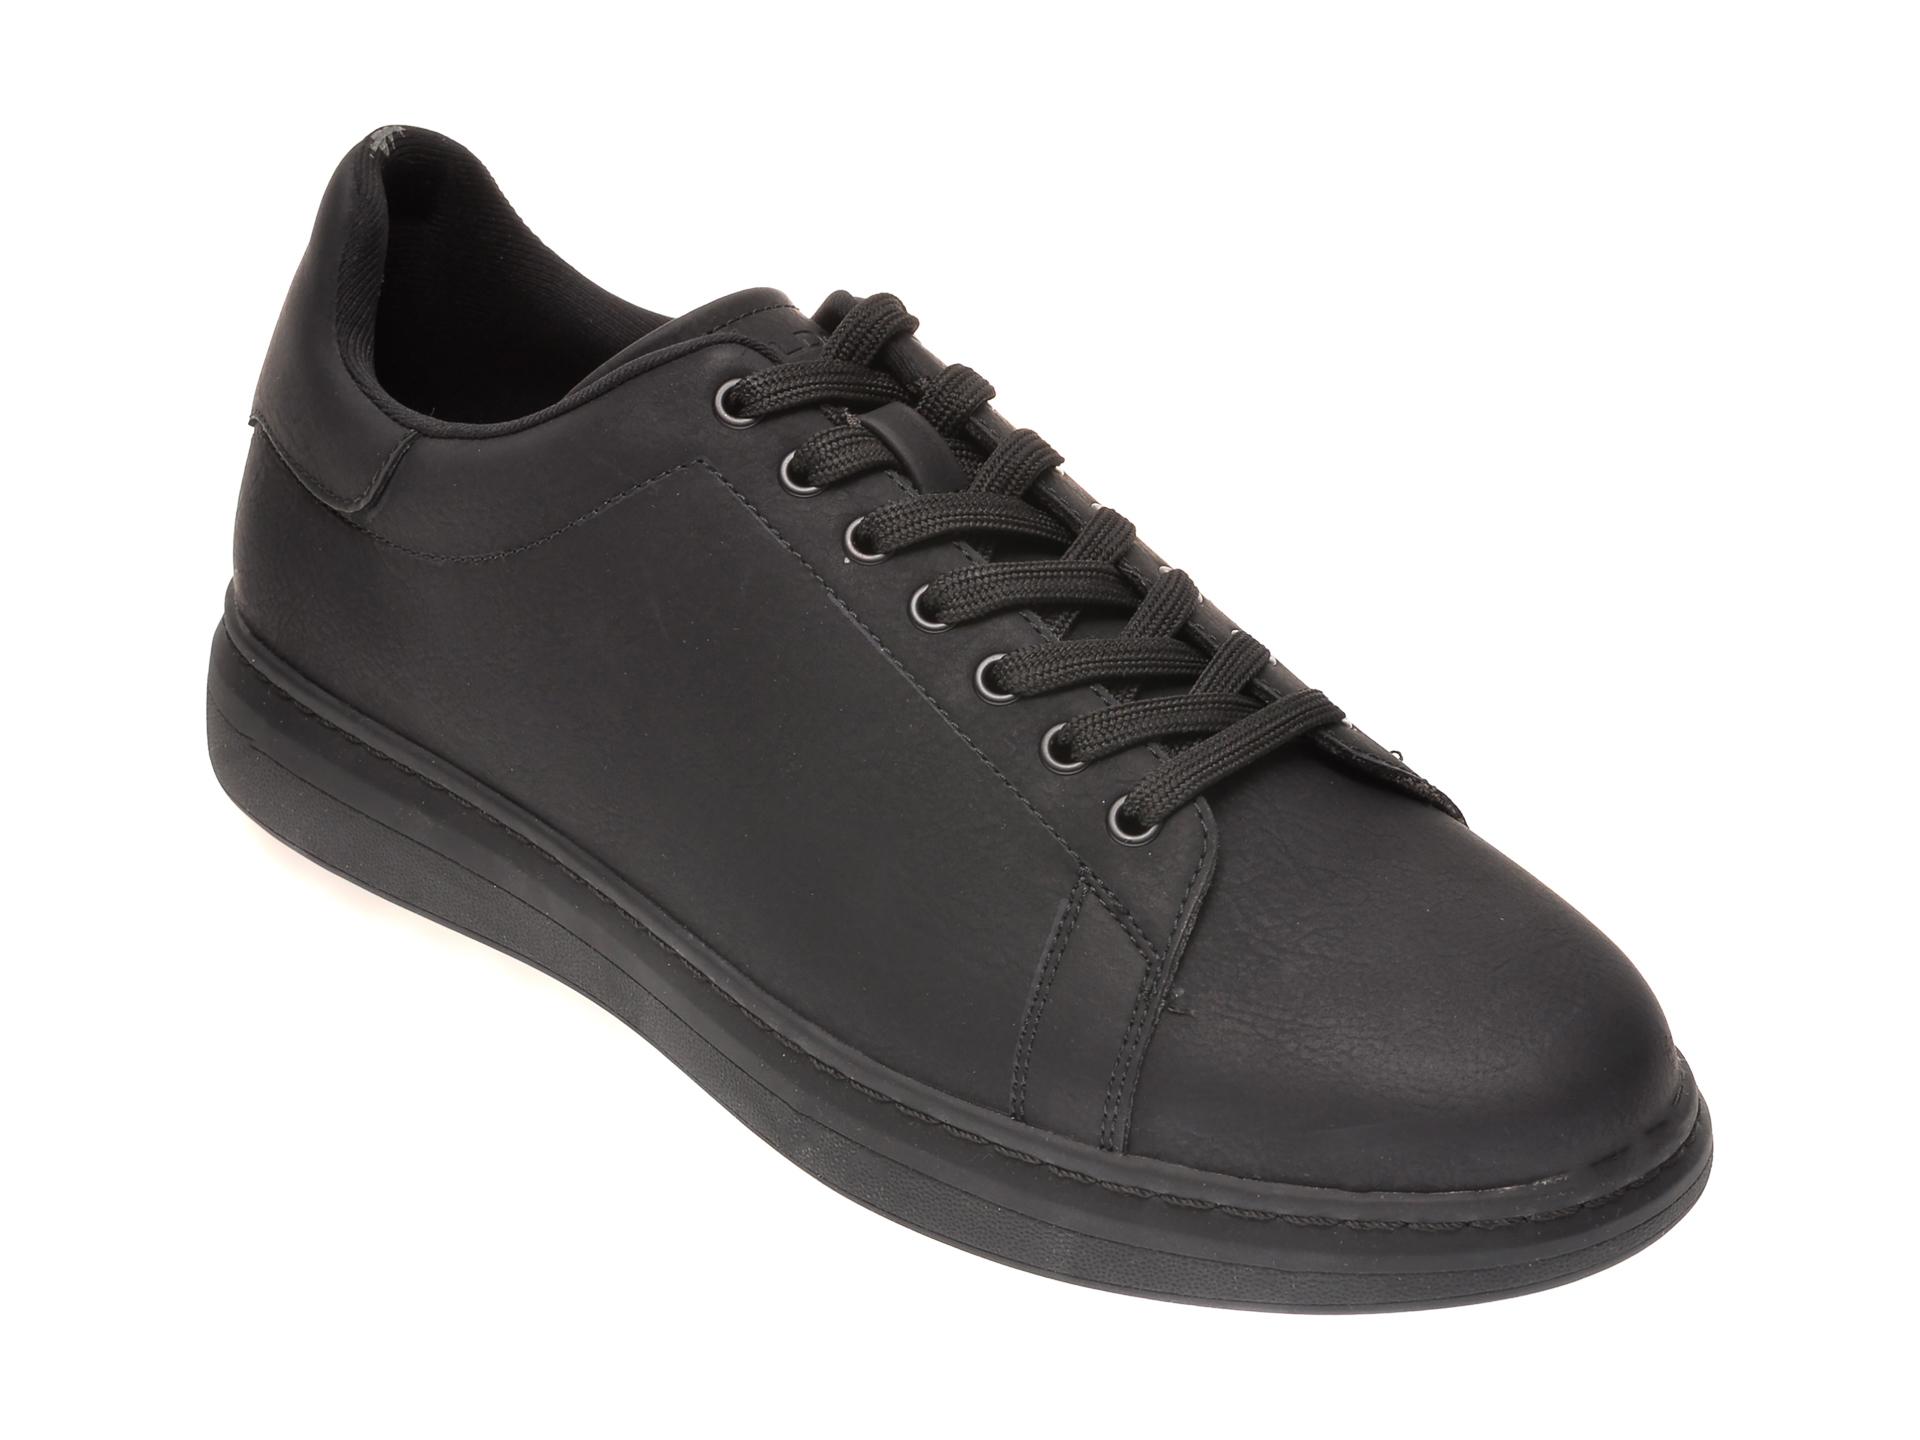 Pantofi Aldo Negri, Dallyn001, Din Piele Ecologica